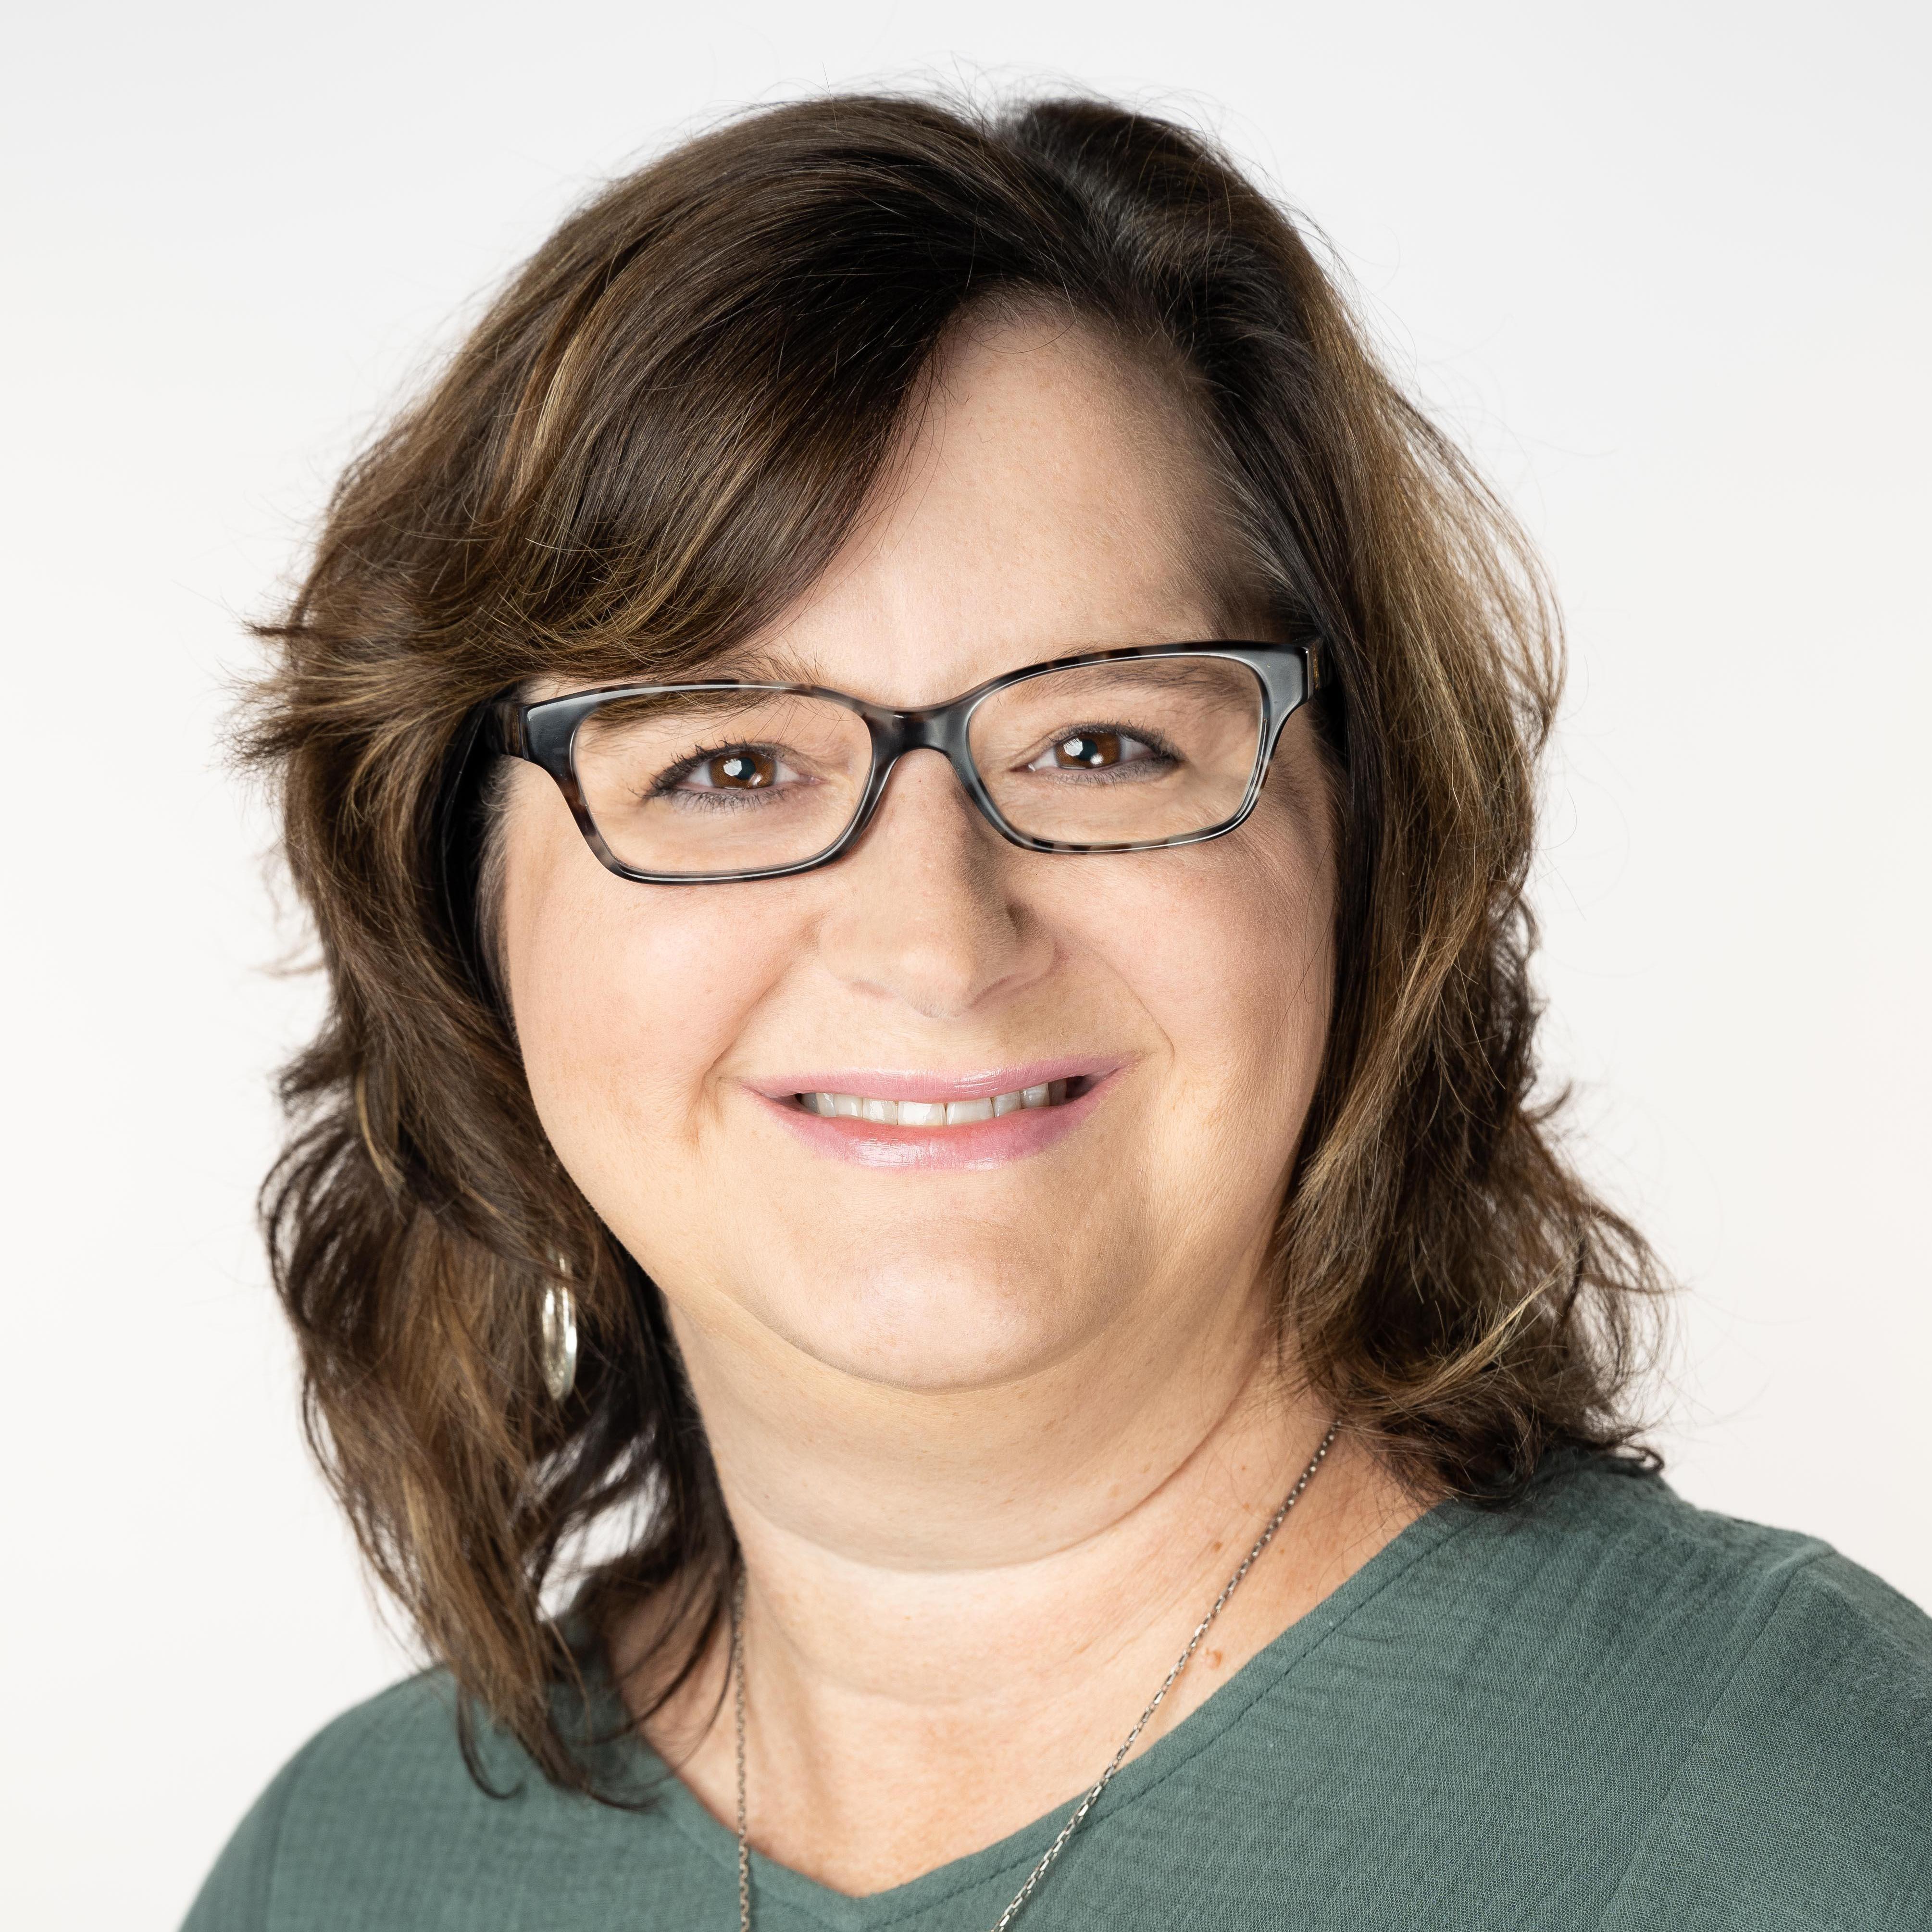 Samantha Frerichs's Profile Photo